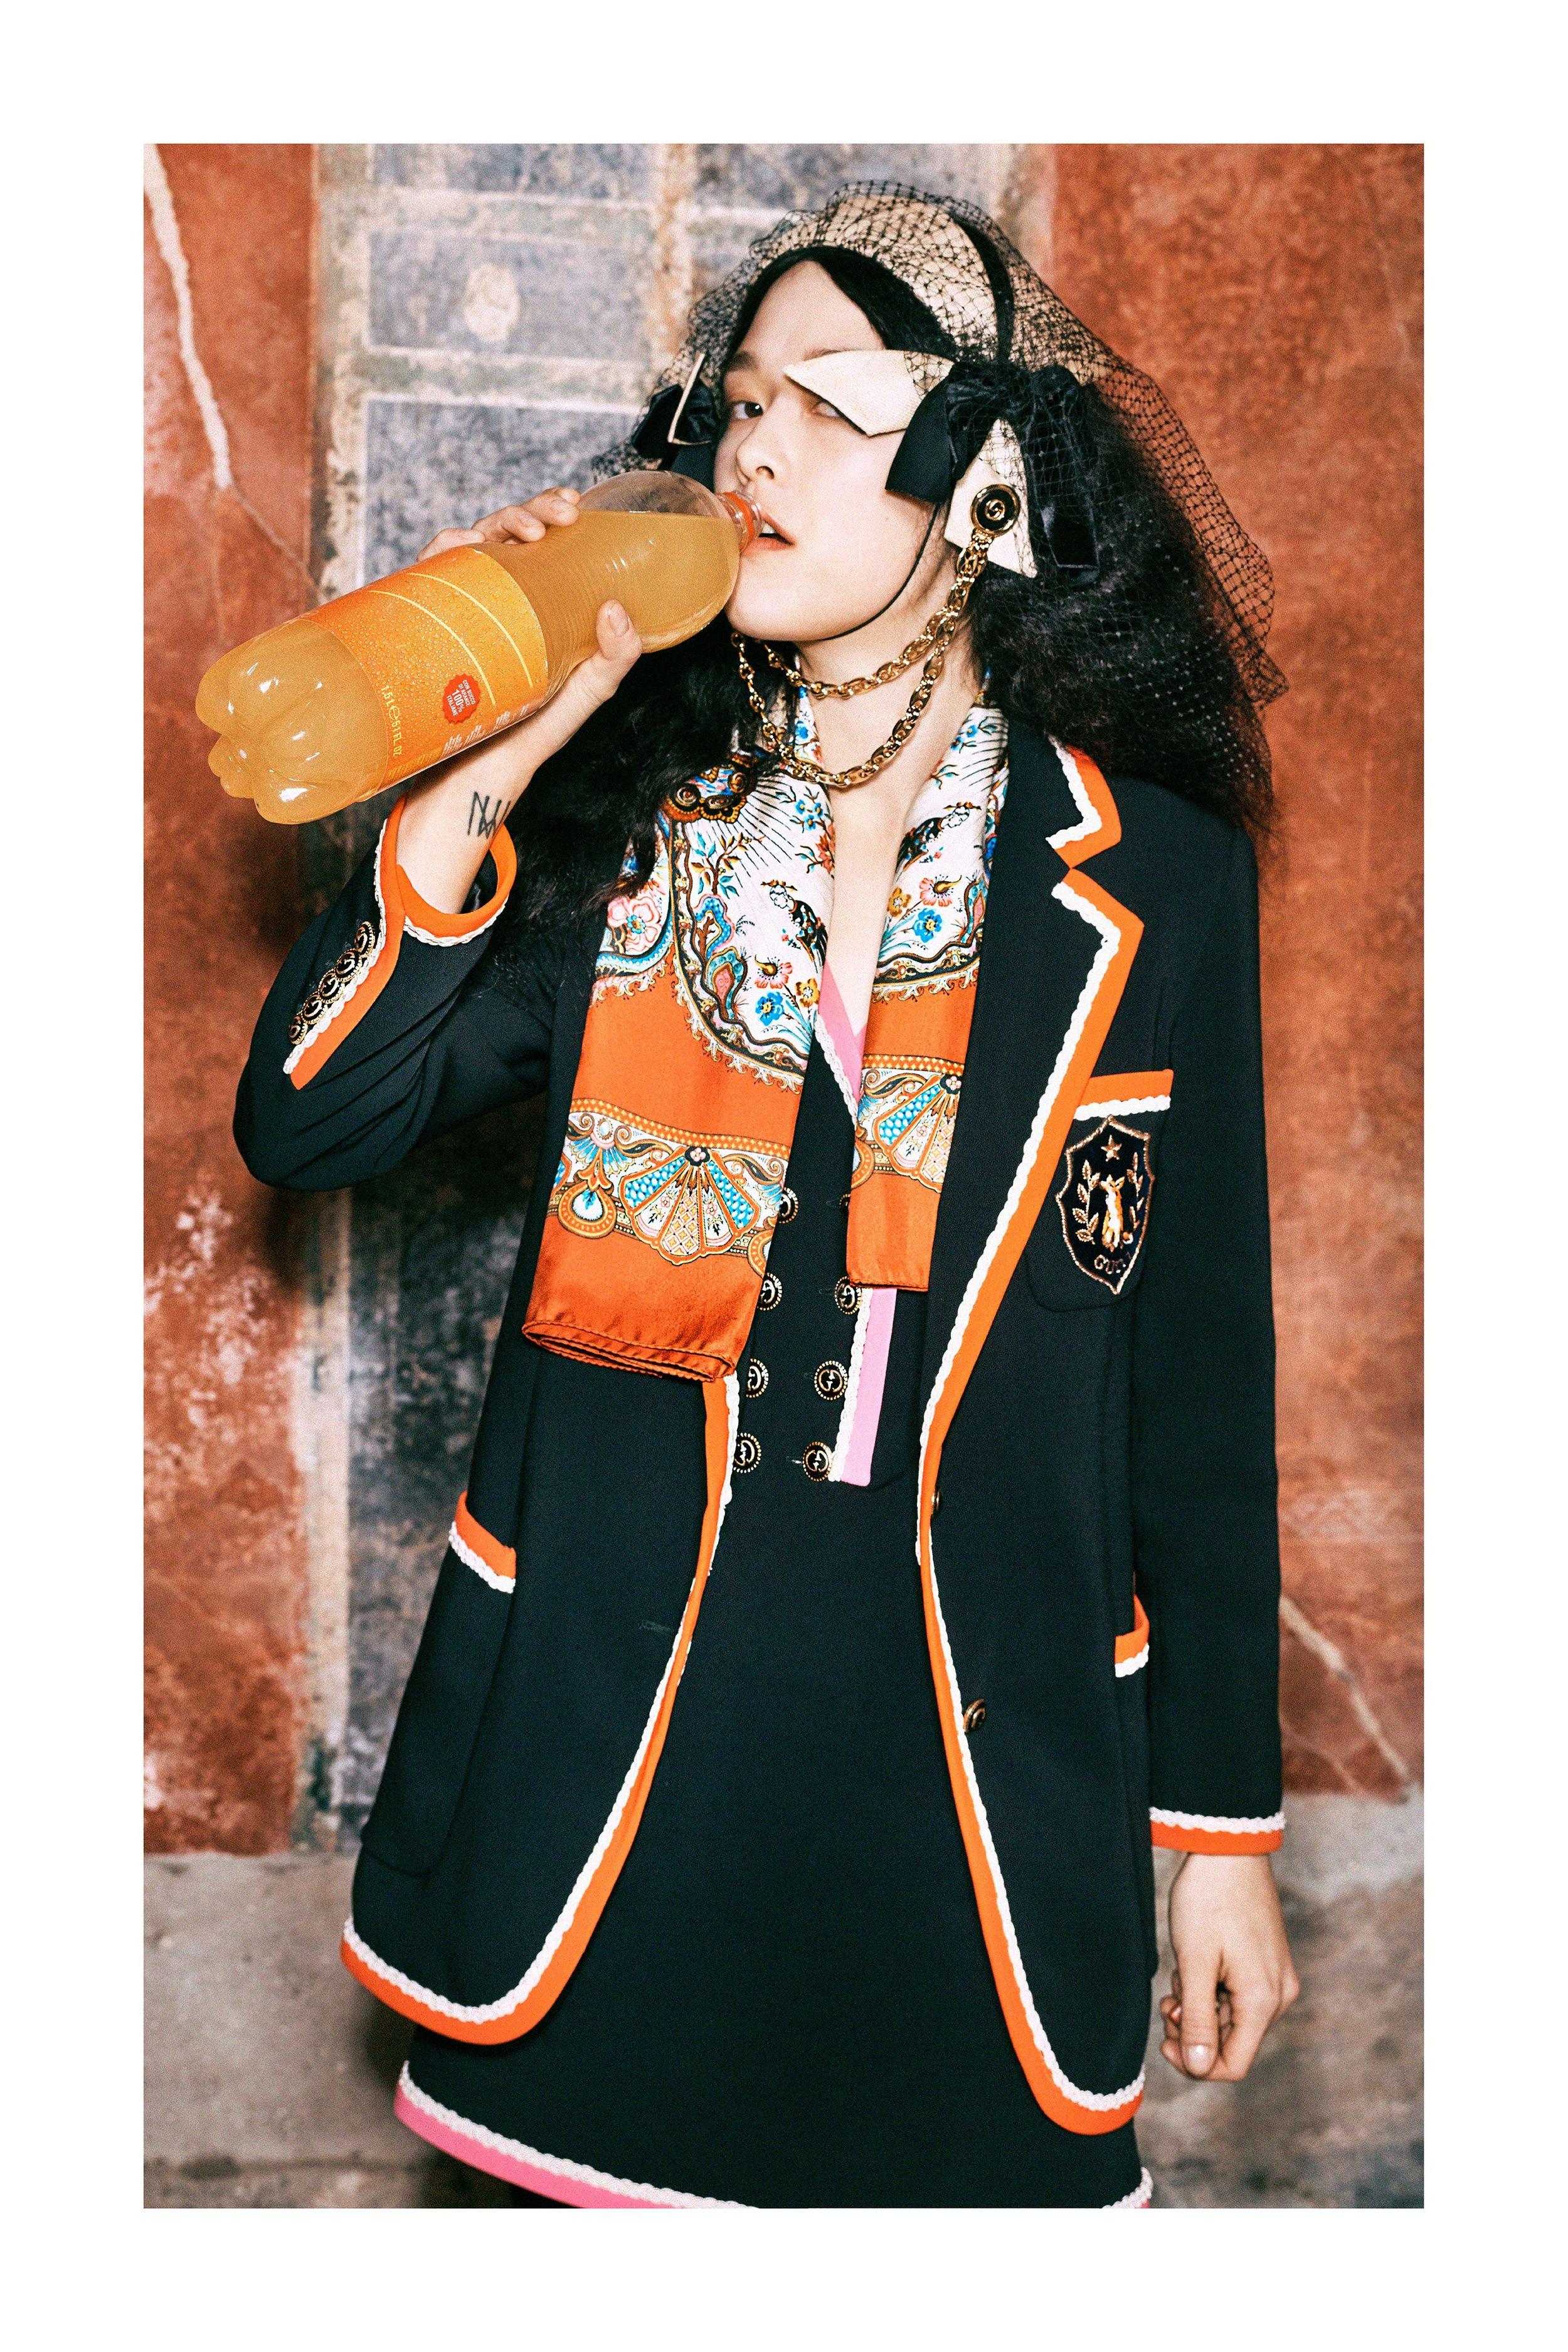 00077-gucci-milan-pre-fall-19-credit-Harmony-Korine.jpg